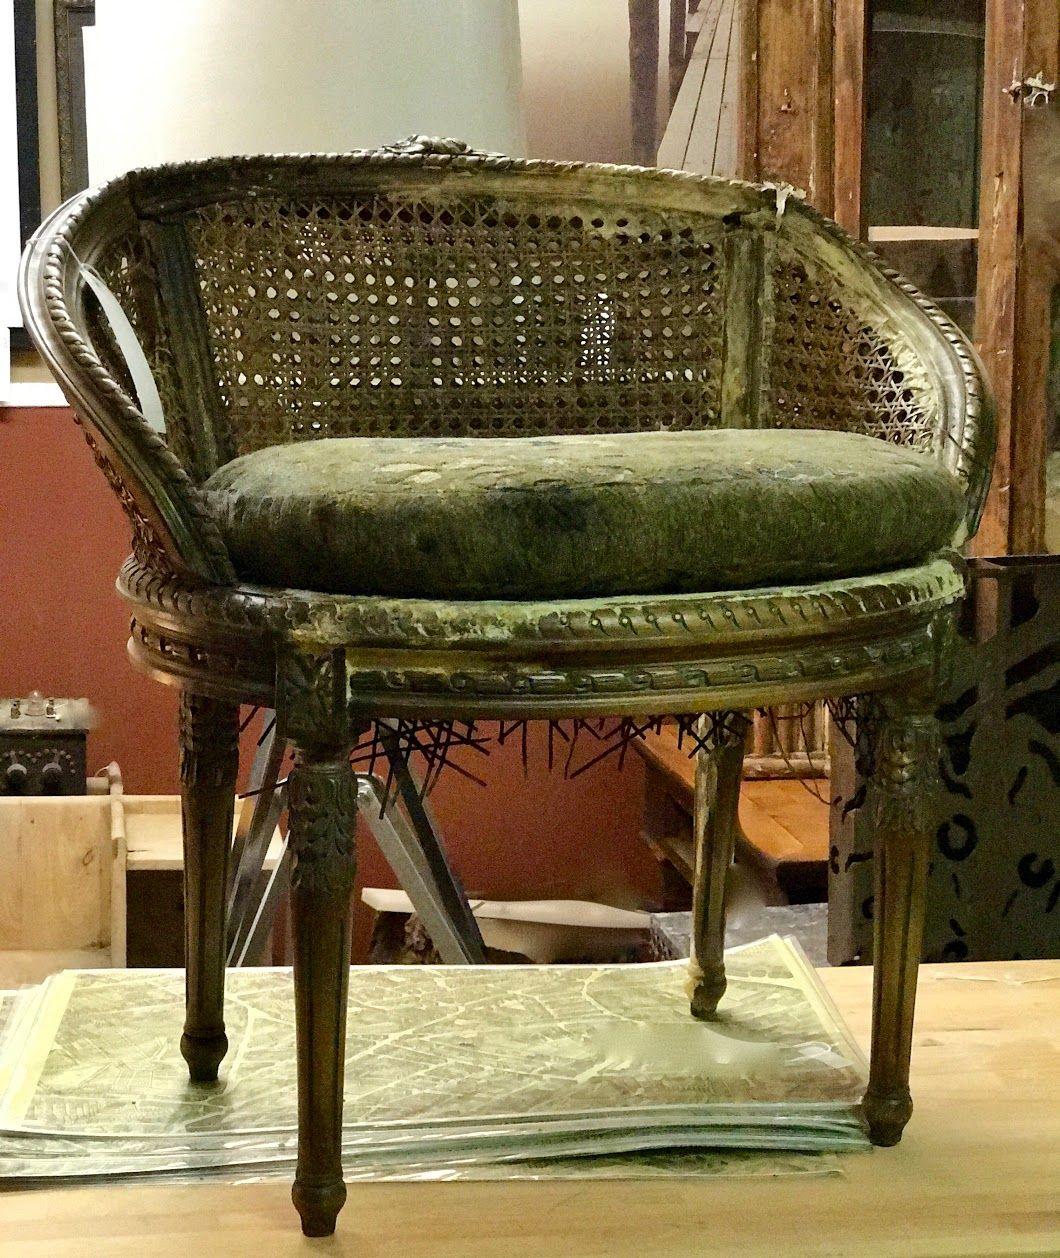 Antique French Chair Dealer #444 $525 Lucas Street Antiques Mall 2023 Lucas  Dr. Dallas - Antique French Chair Dealer #444 $525 Lucas Street Antiques Mall